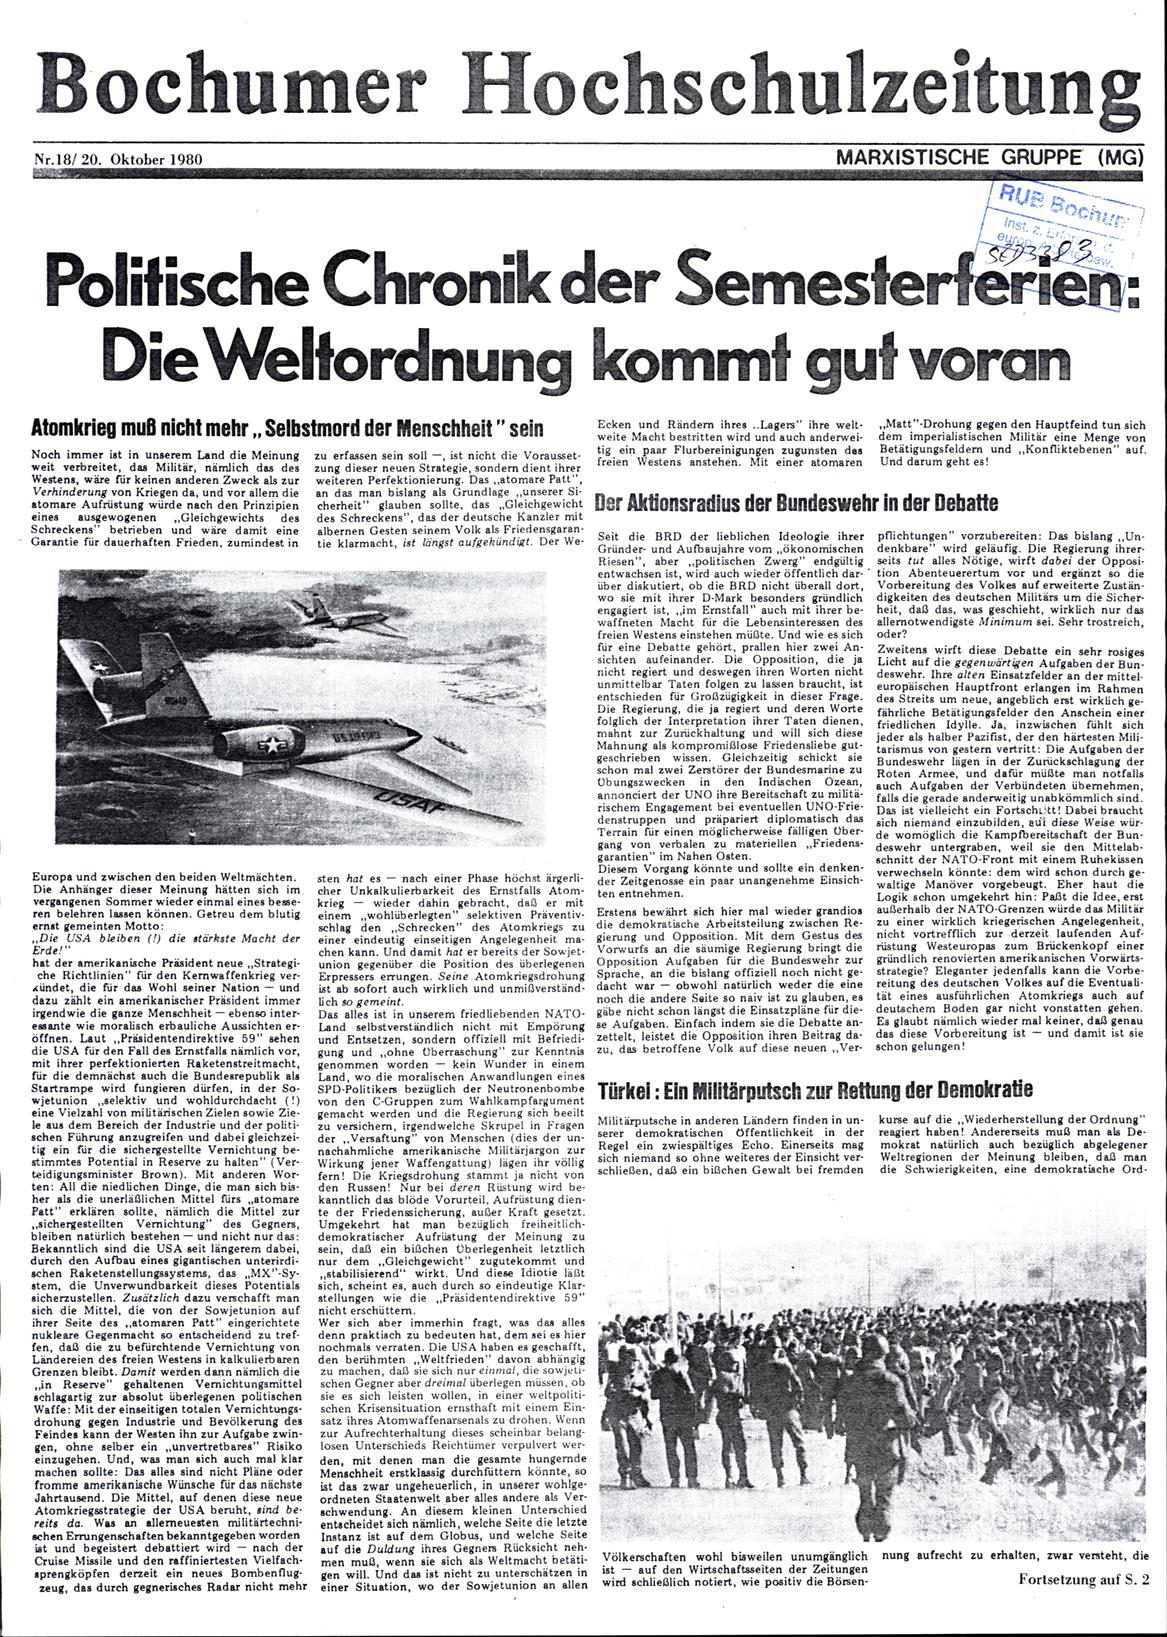 Bochum_BHZ_19801020_018_001